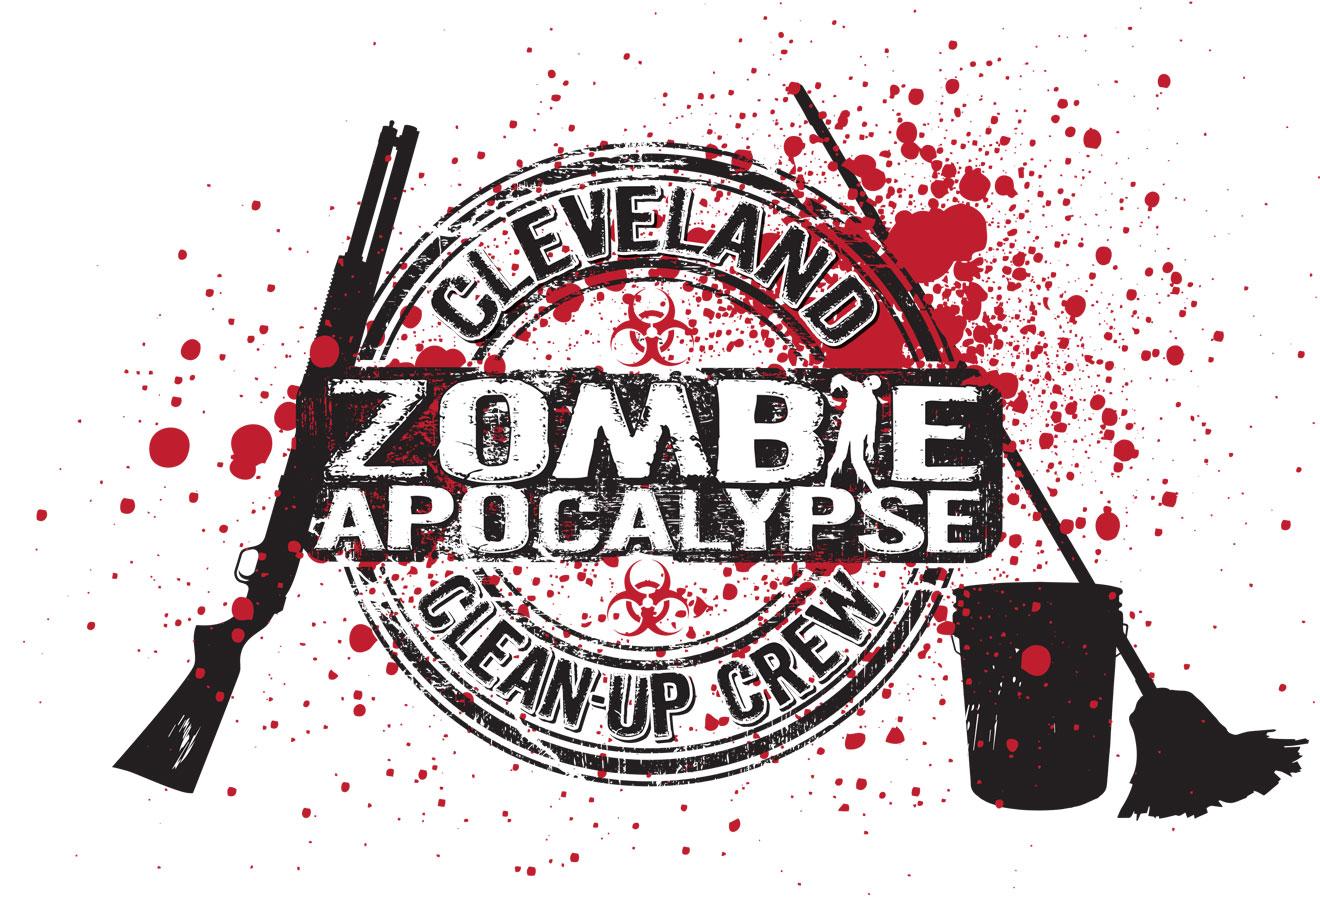 Masek-Art-Zombie Cleanup Crew